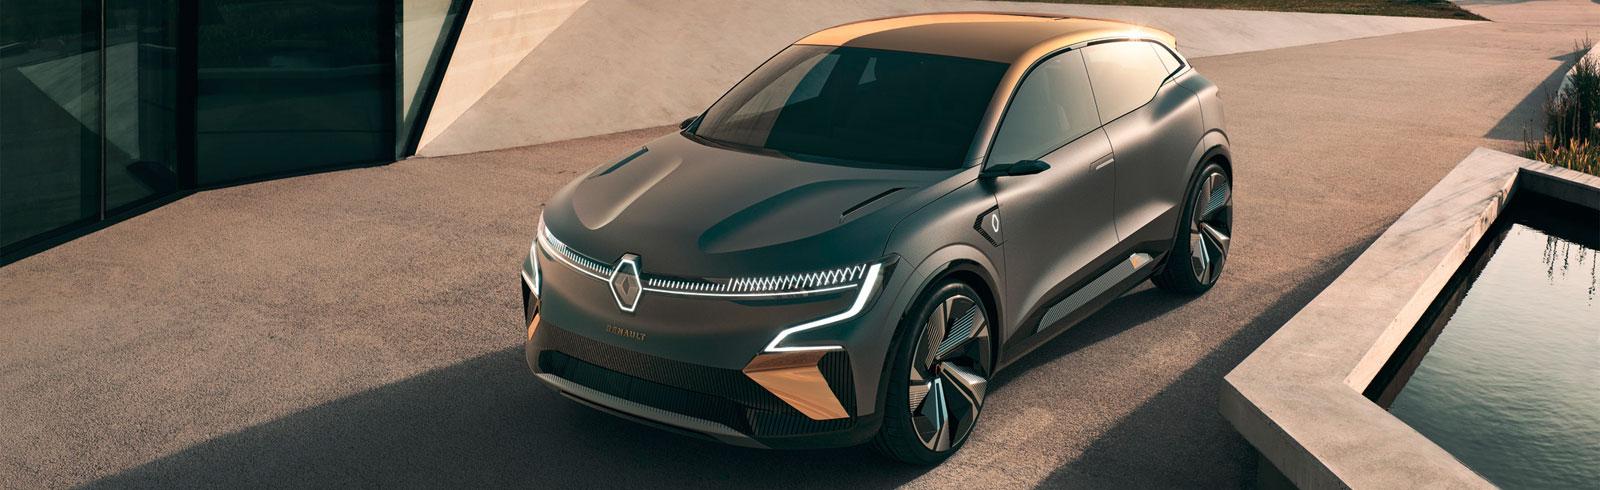 Renault introduces the Mégane eVision based on the CMF-EV platform